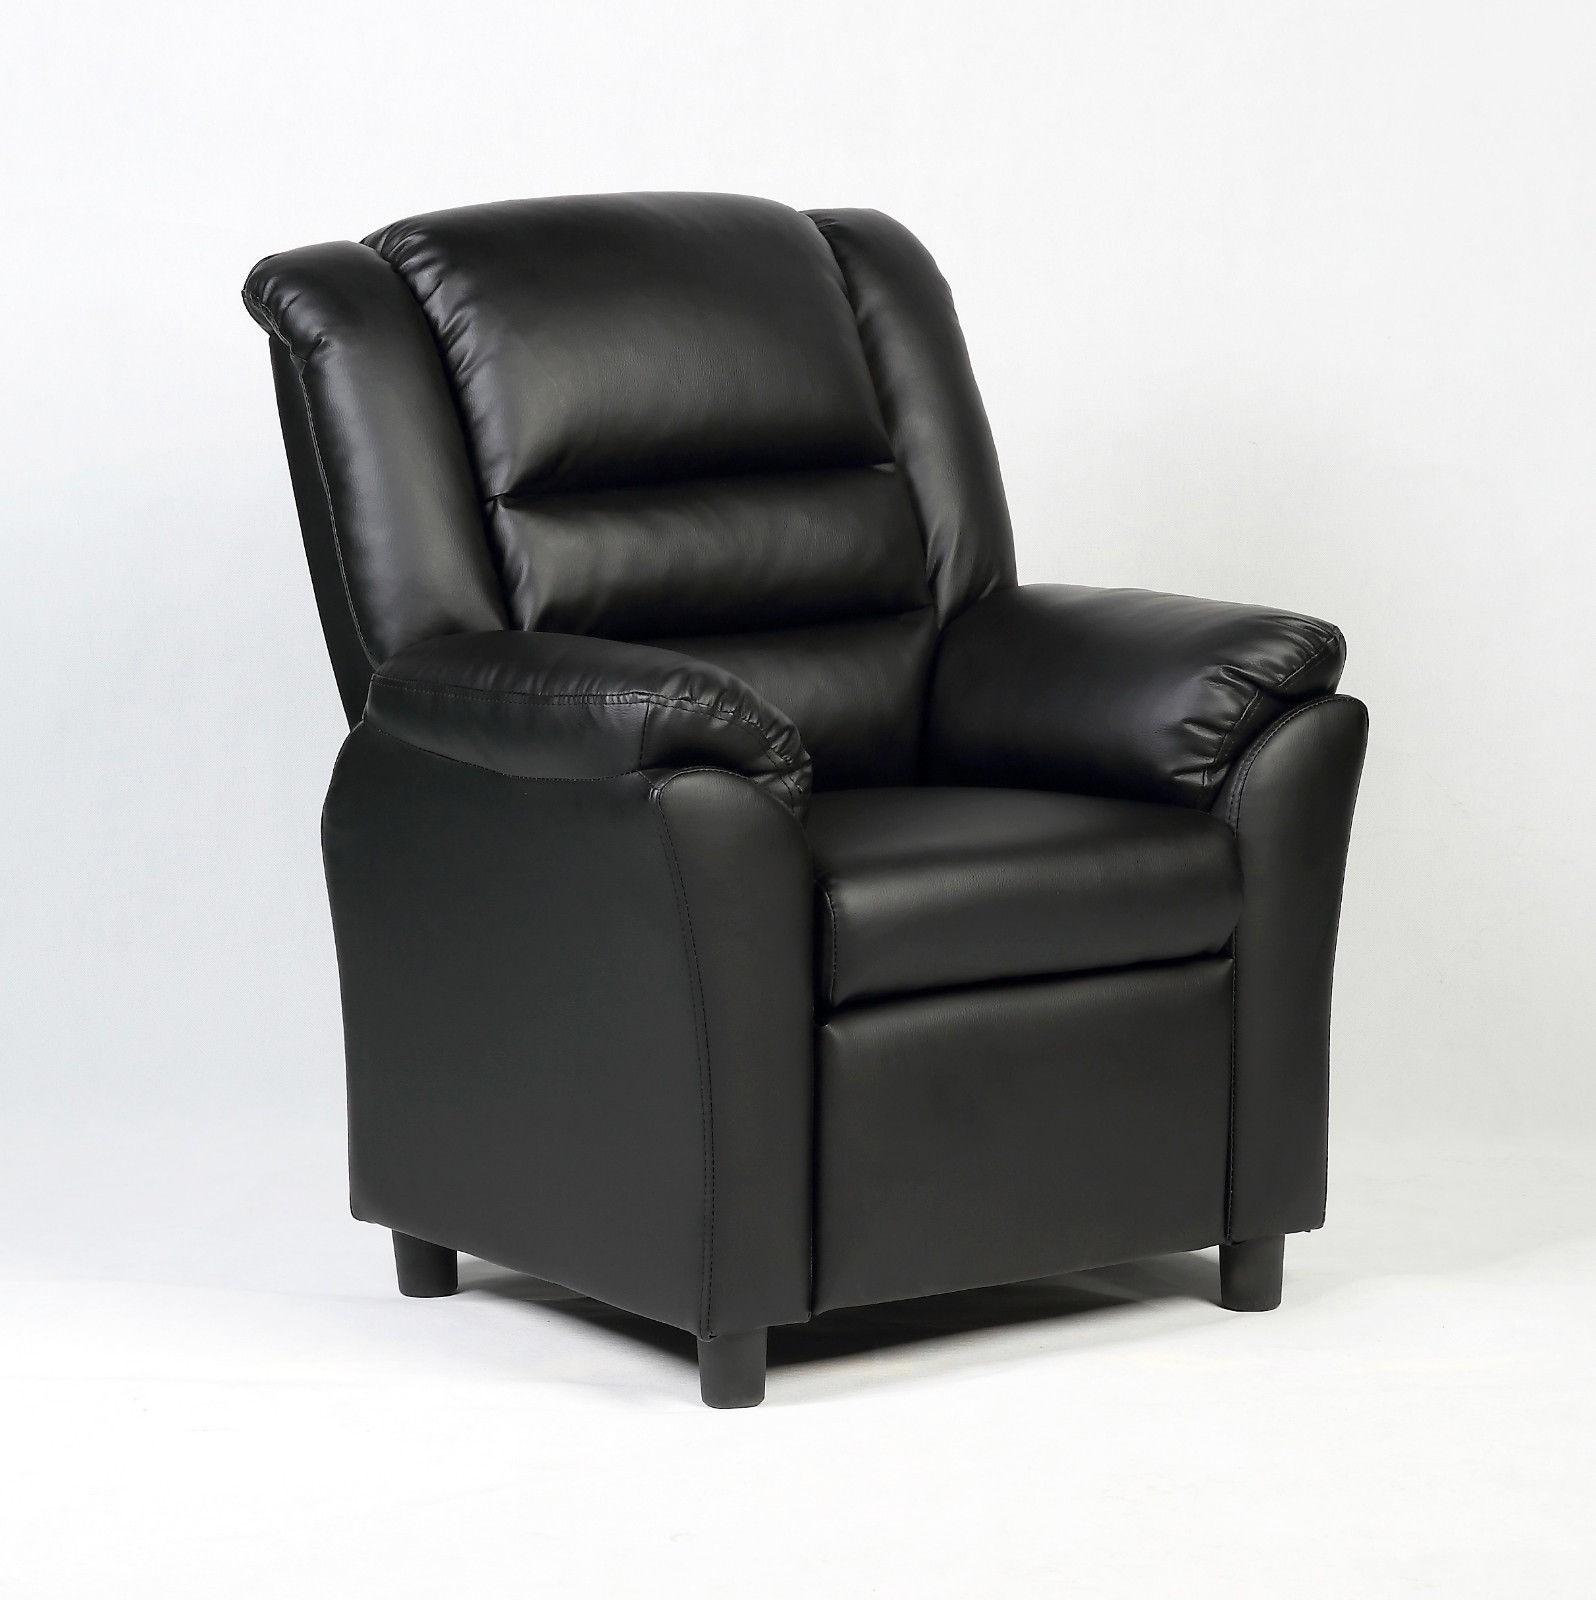 Ergonomic Kids Sofa Manual Recliner Arm Chairs Recliners In Ergonomic Sofas And Chairs (Image 10 of 15)